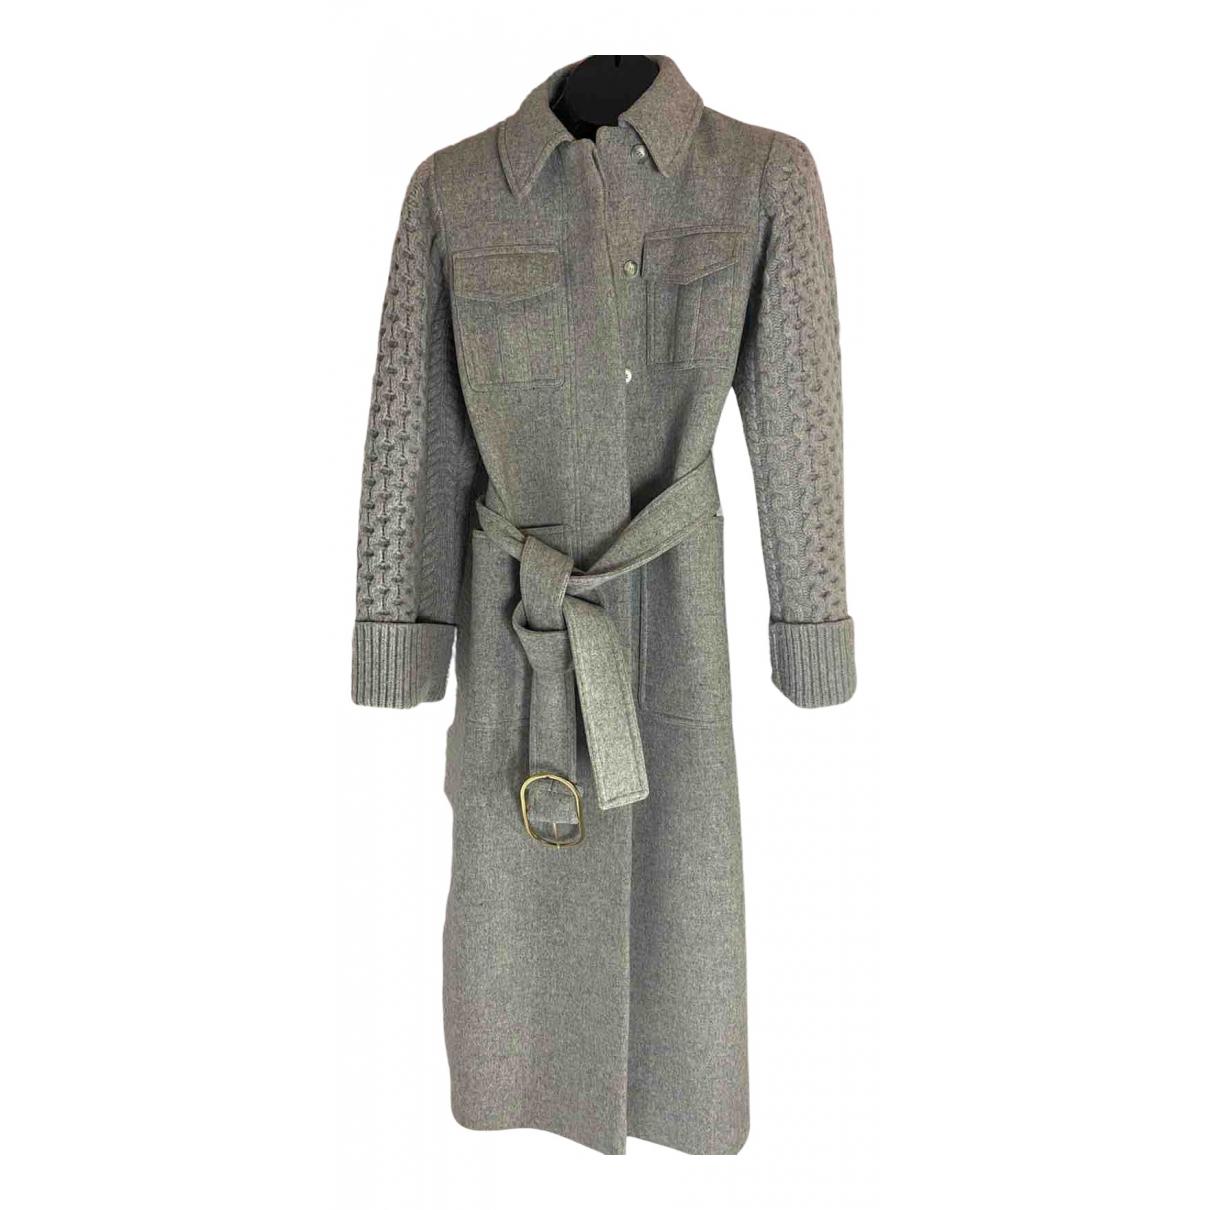 Stella Mccartney \N Grey Wool coat for Women S International